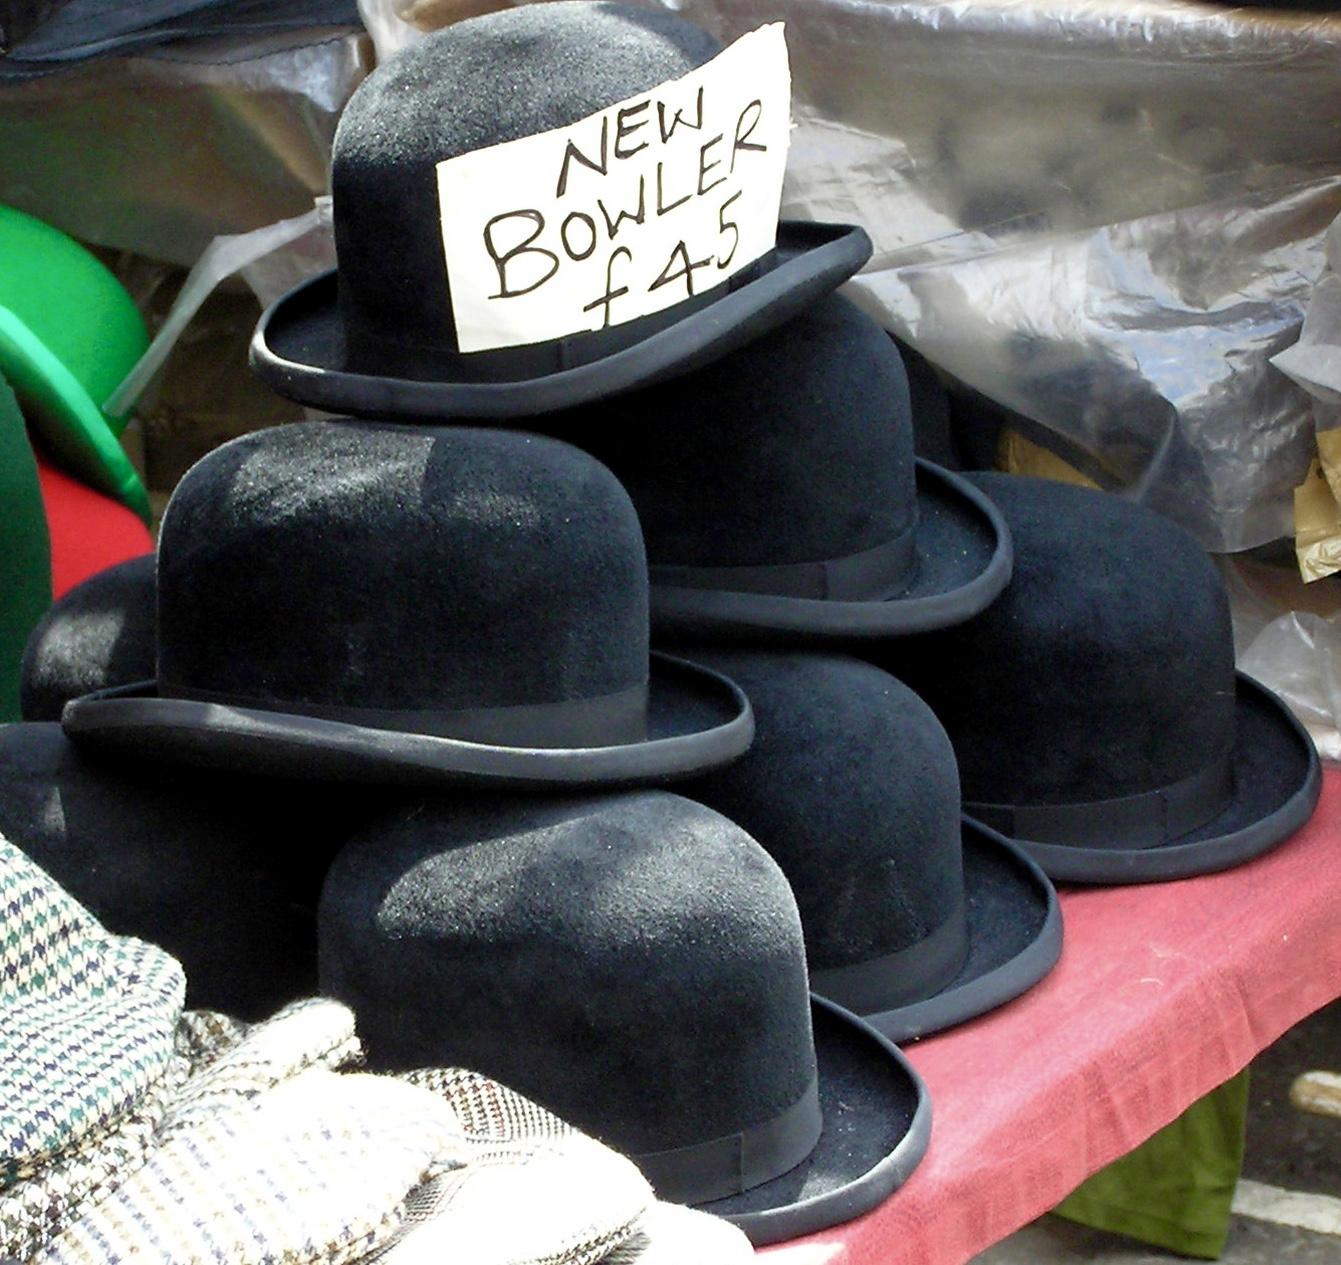 Bowler.hats.portobello.london.arp.jpg